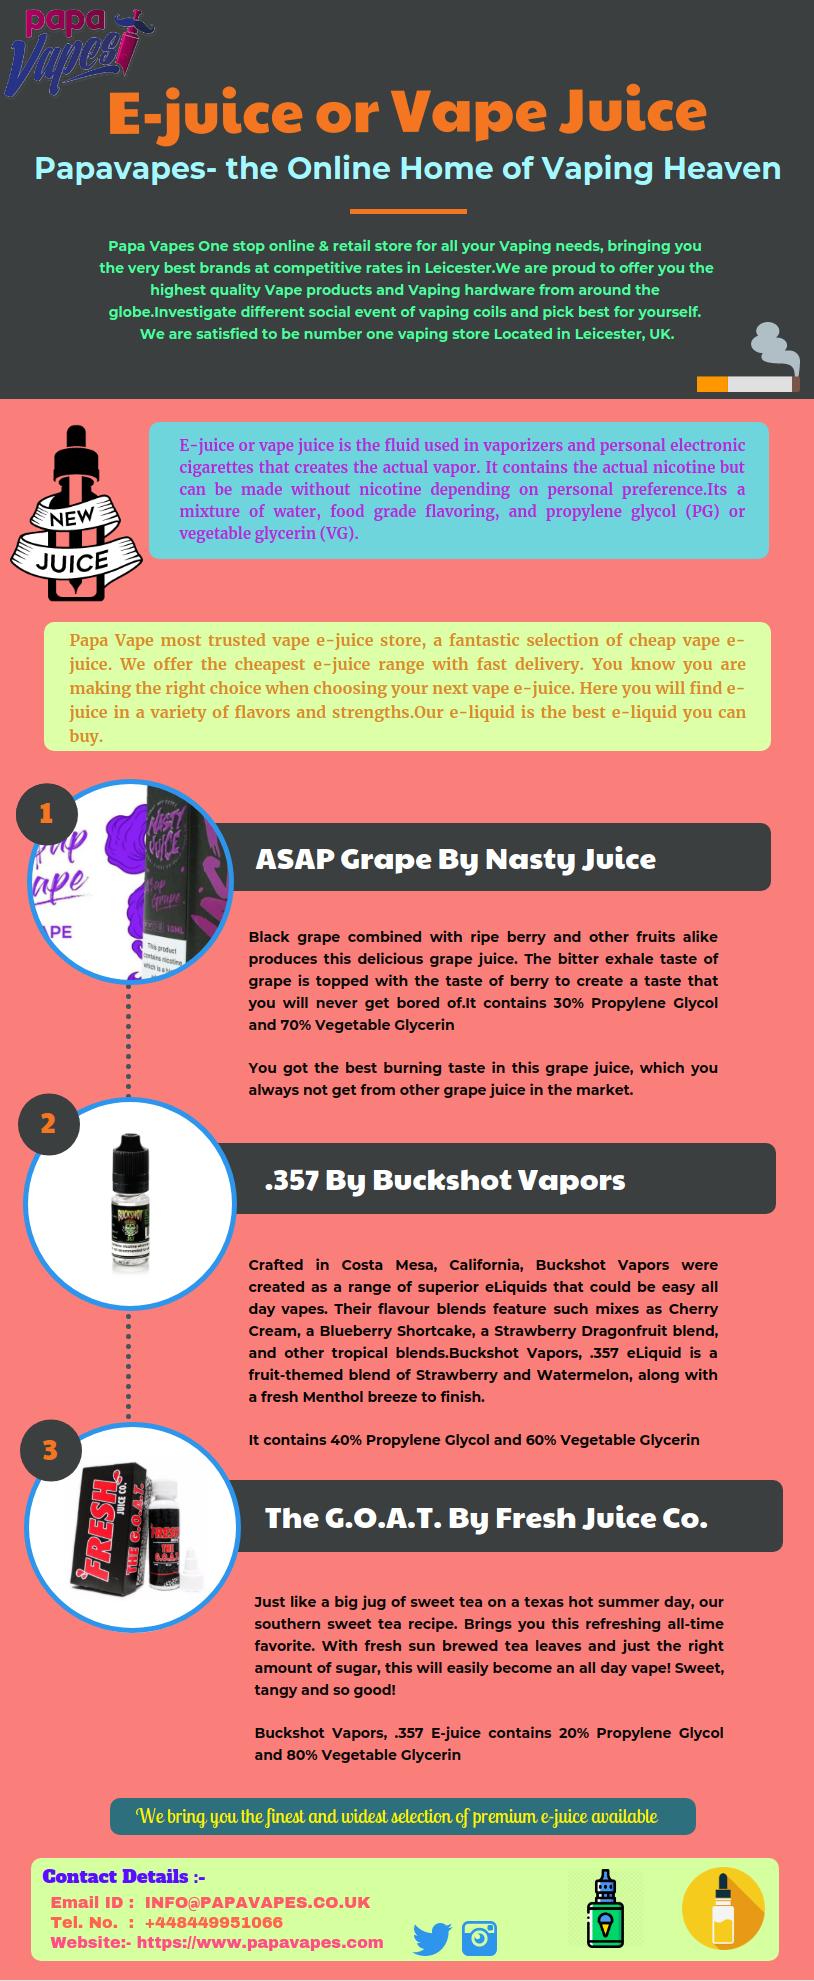 Papa Vape, the most trusted e-juice store, a fantastic